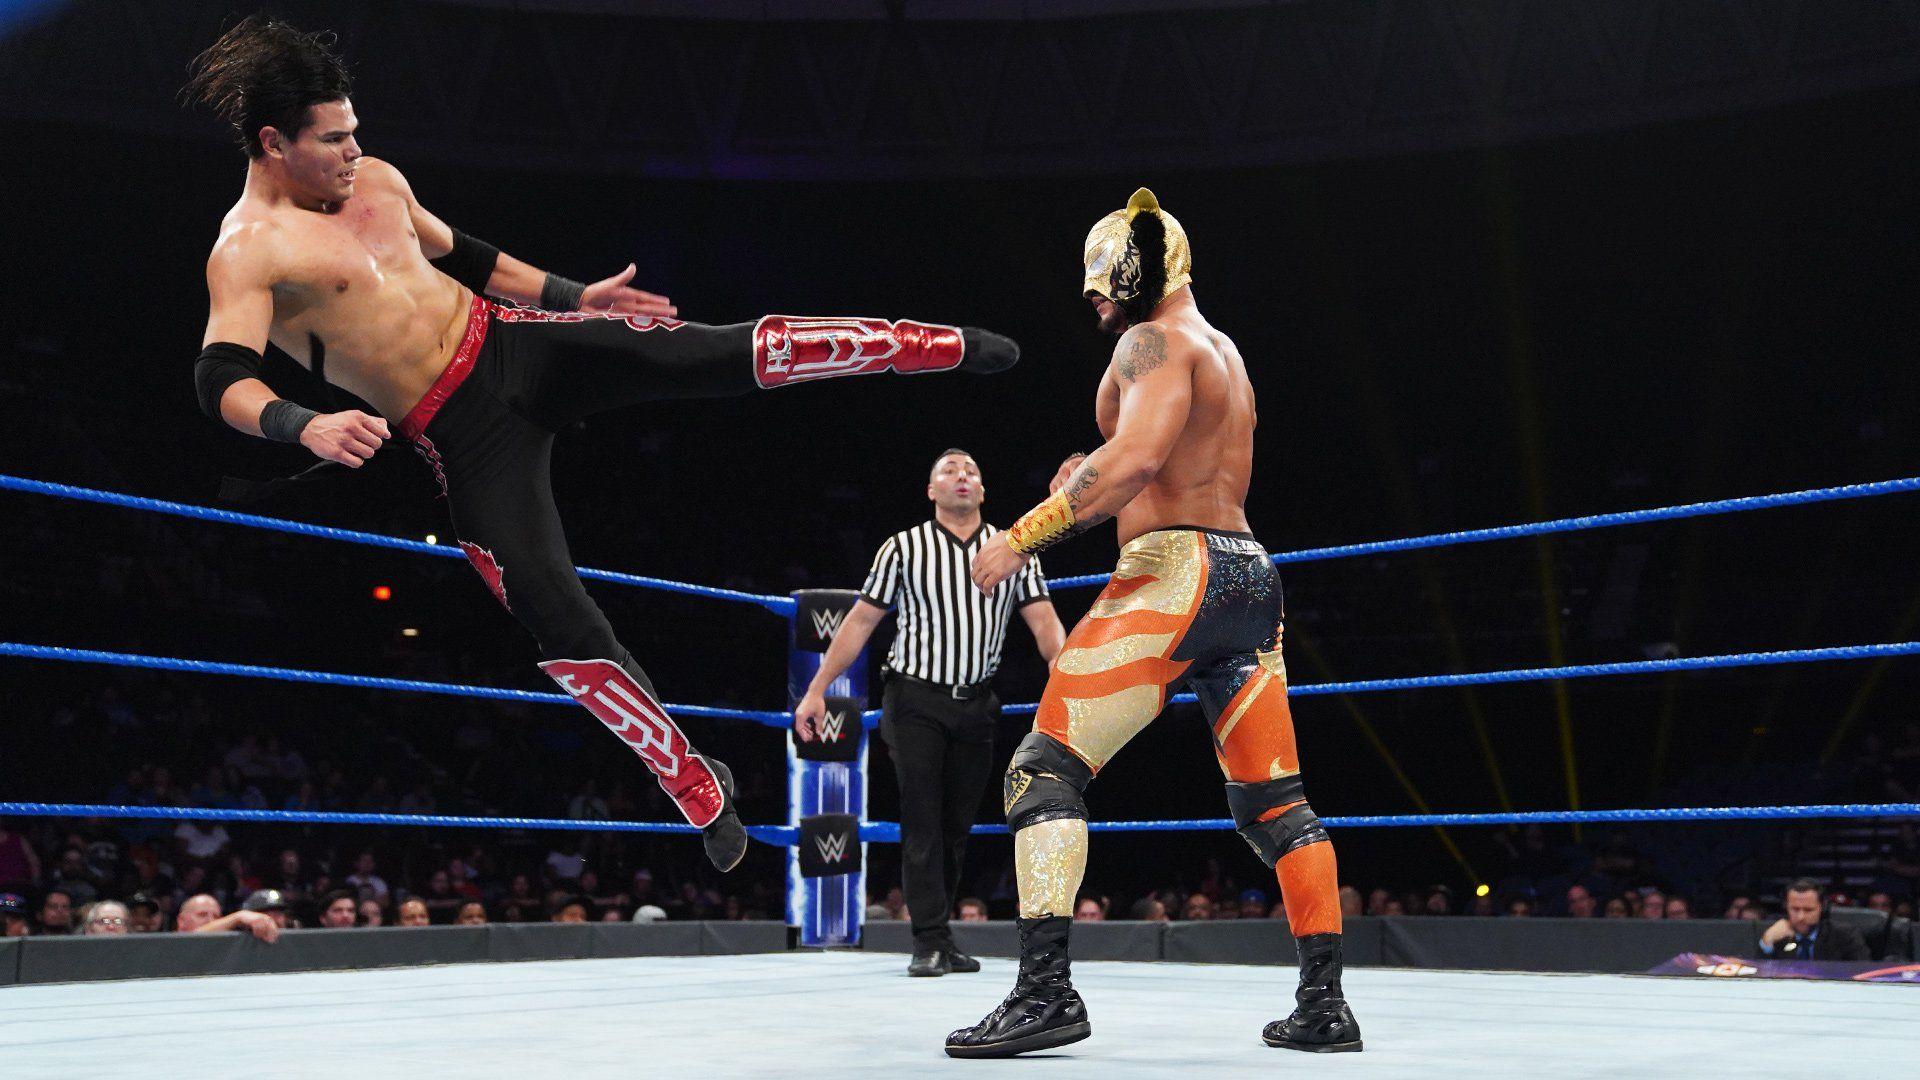 Lince Dorado Def Humberto Carrillo Wwe Raw Results Raw